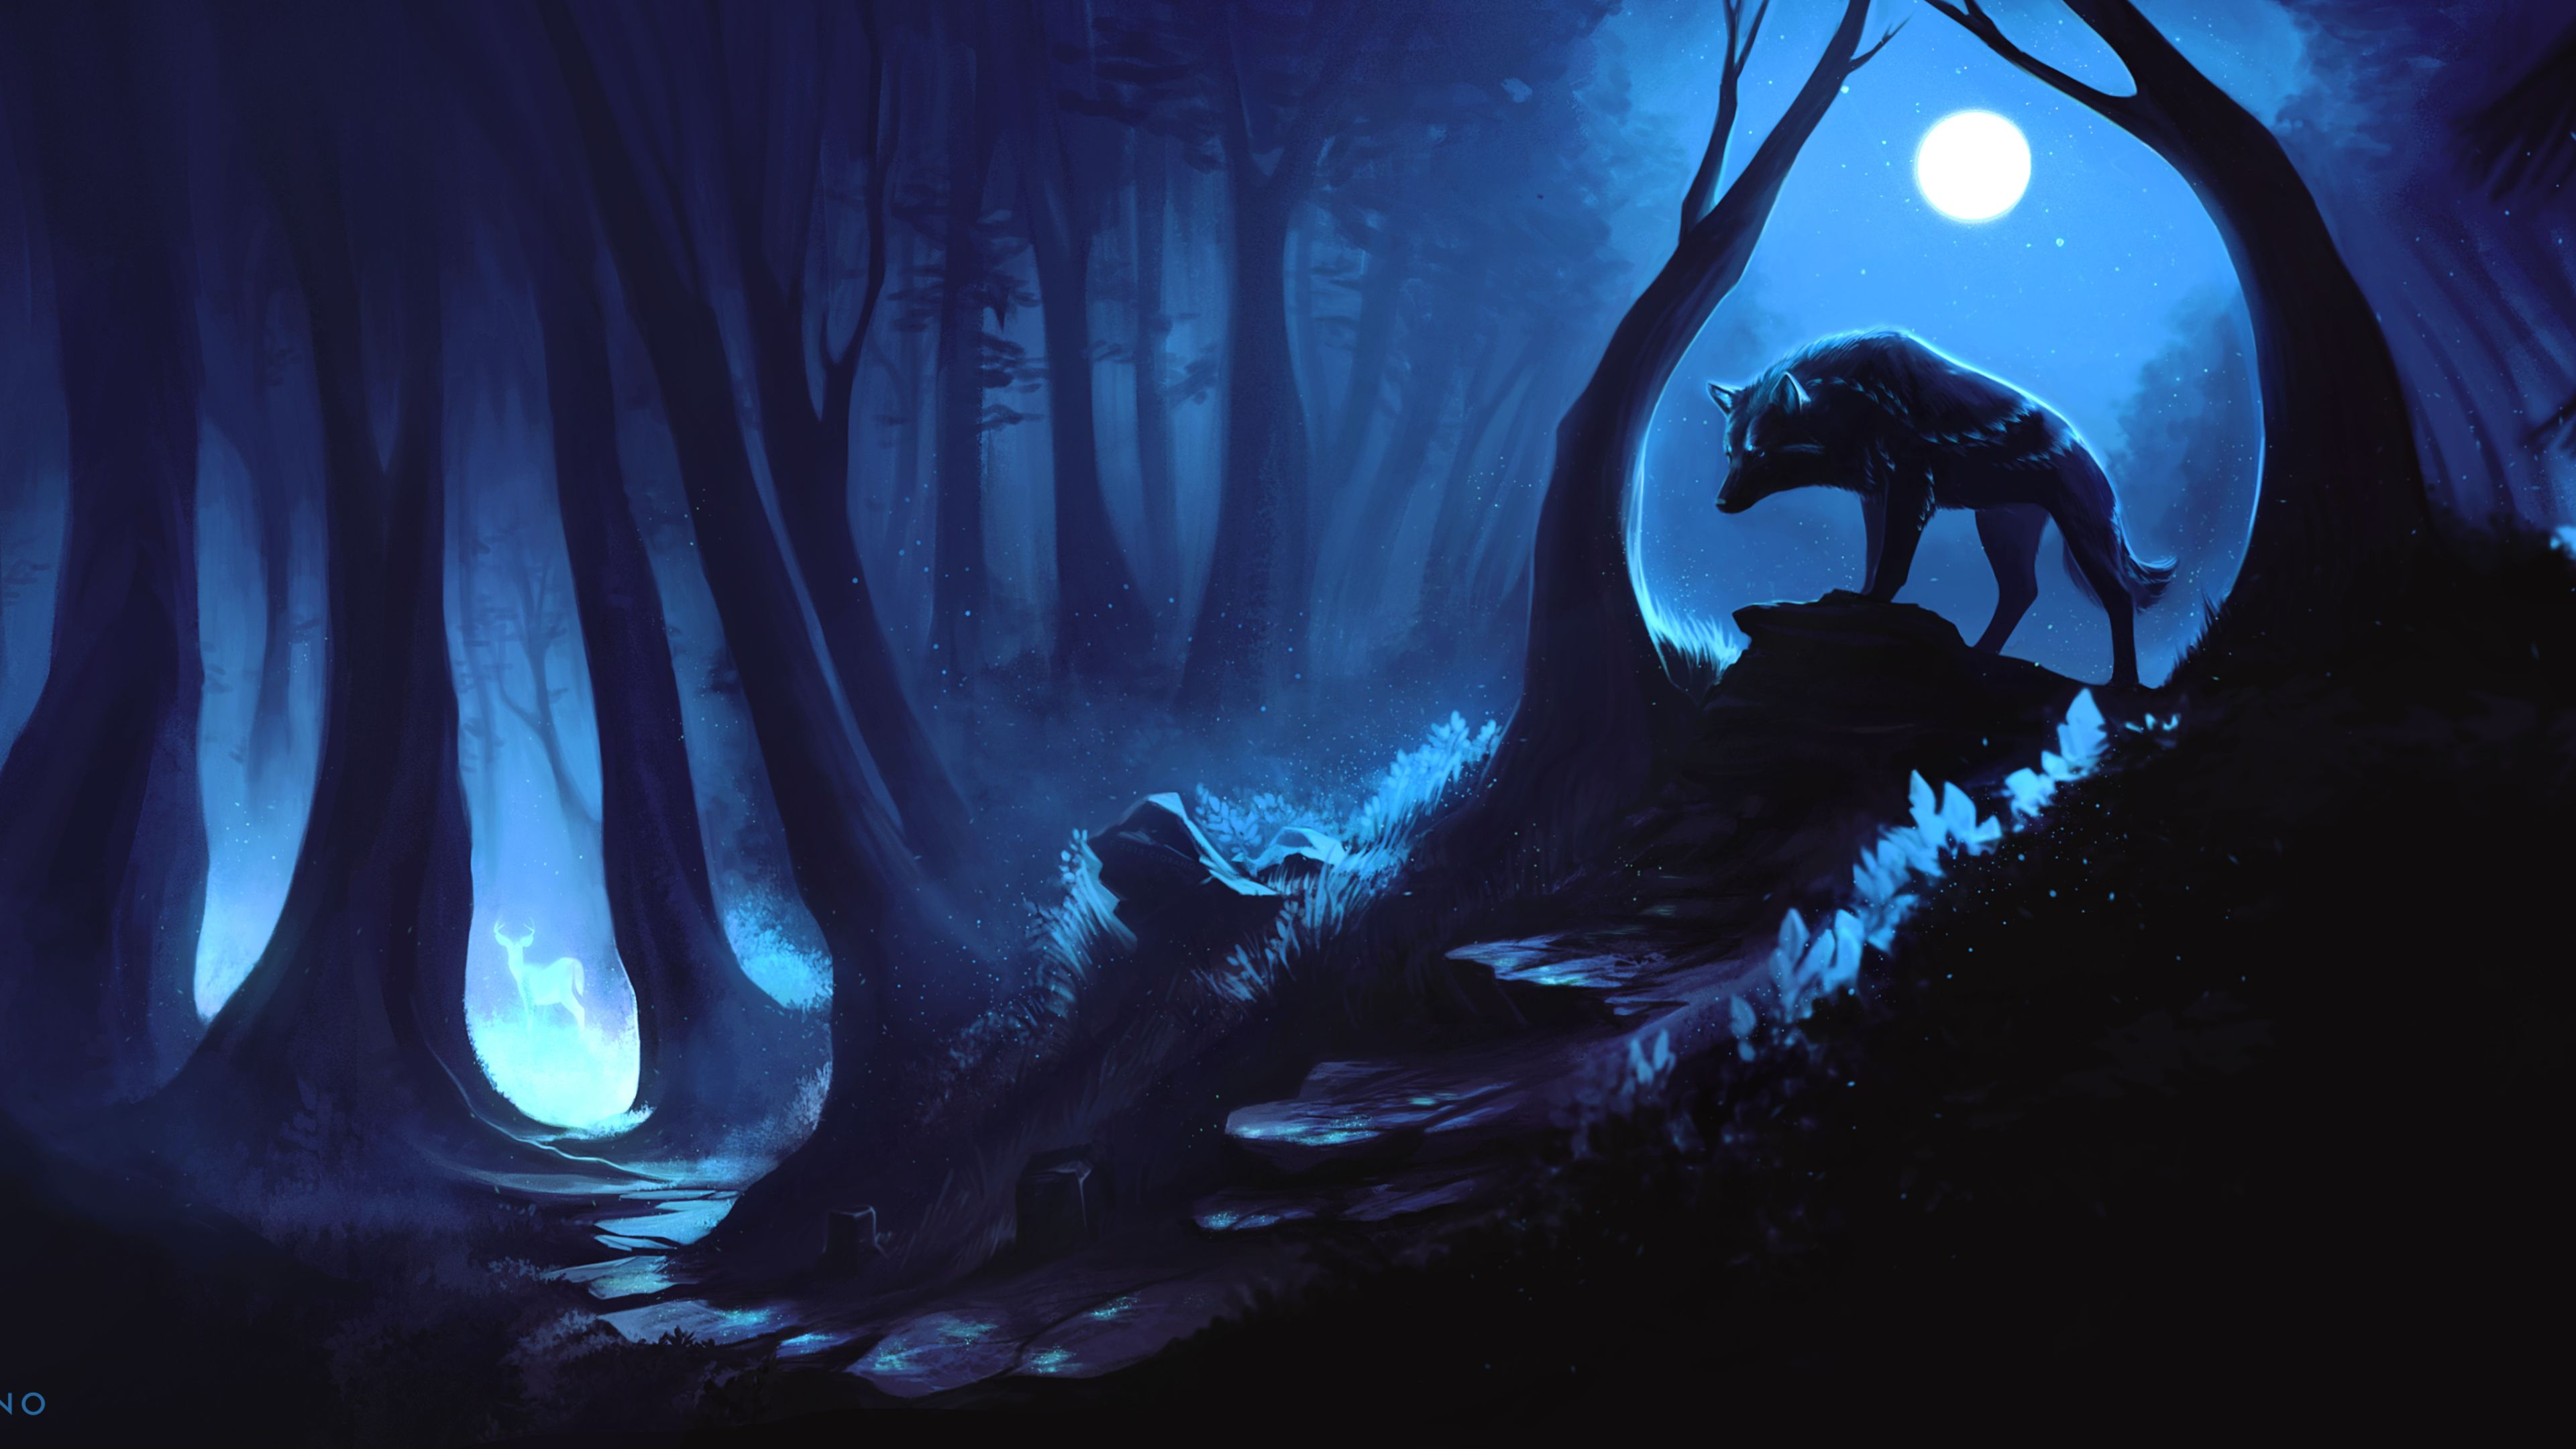 Wolf Hunting Prey 4k wolf wallpapers hd wallpapers digital art 3840x2160